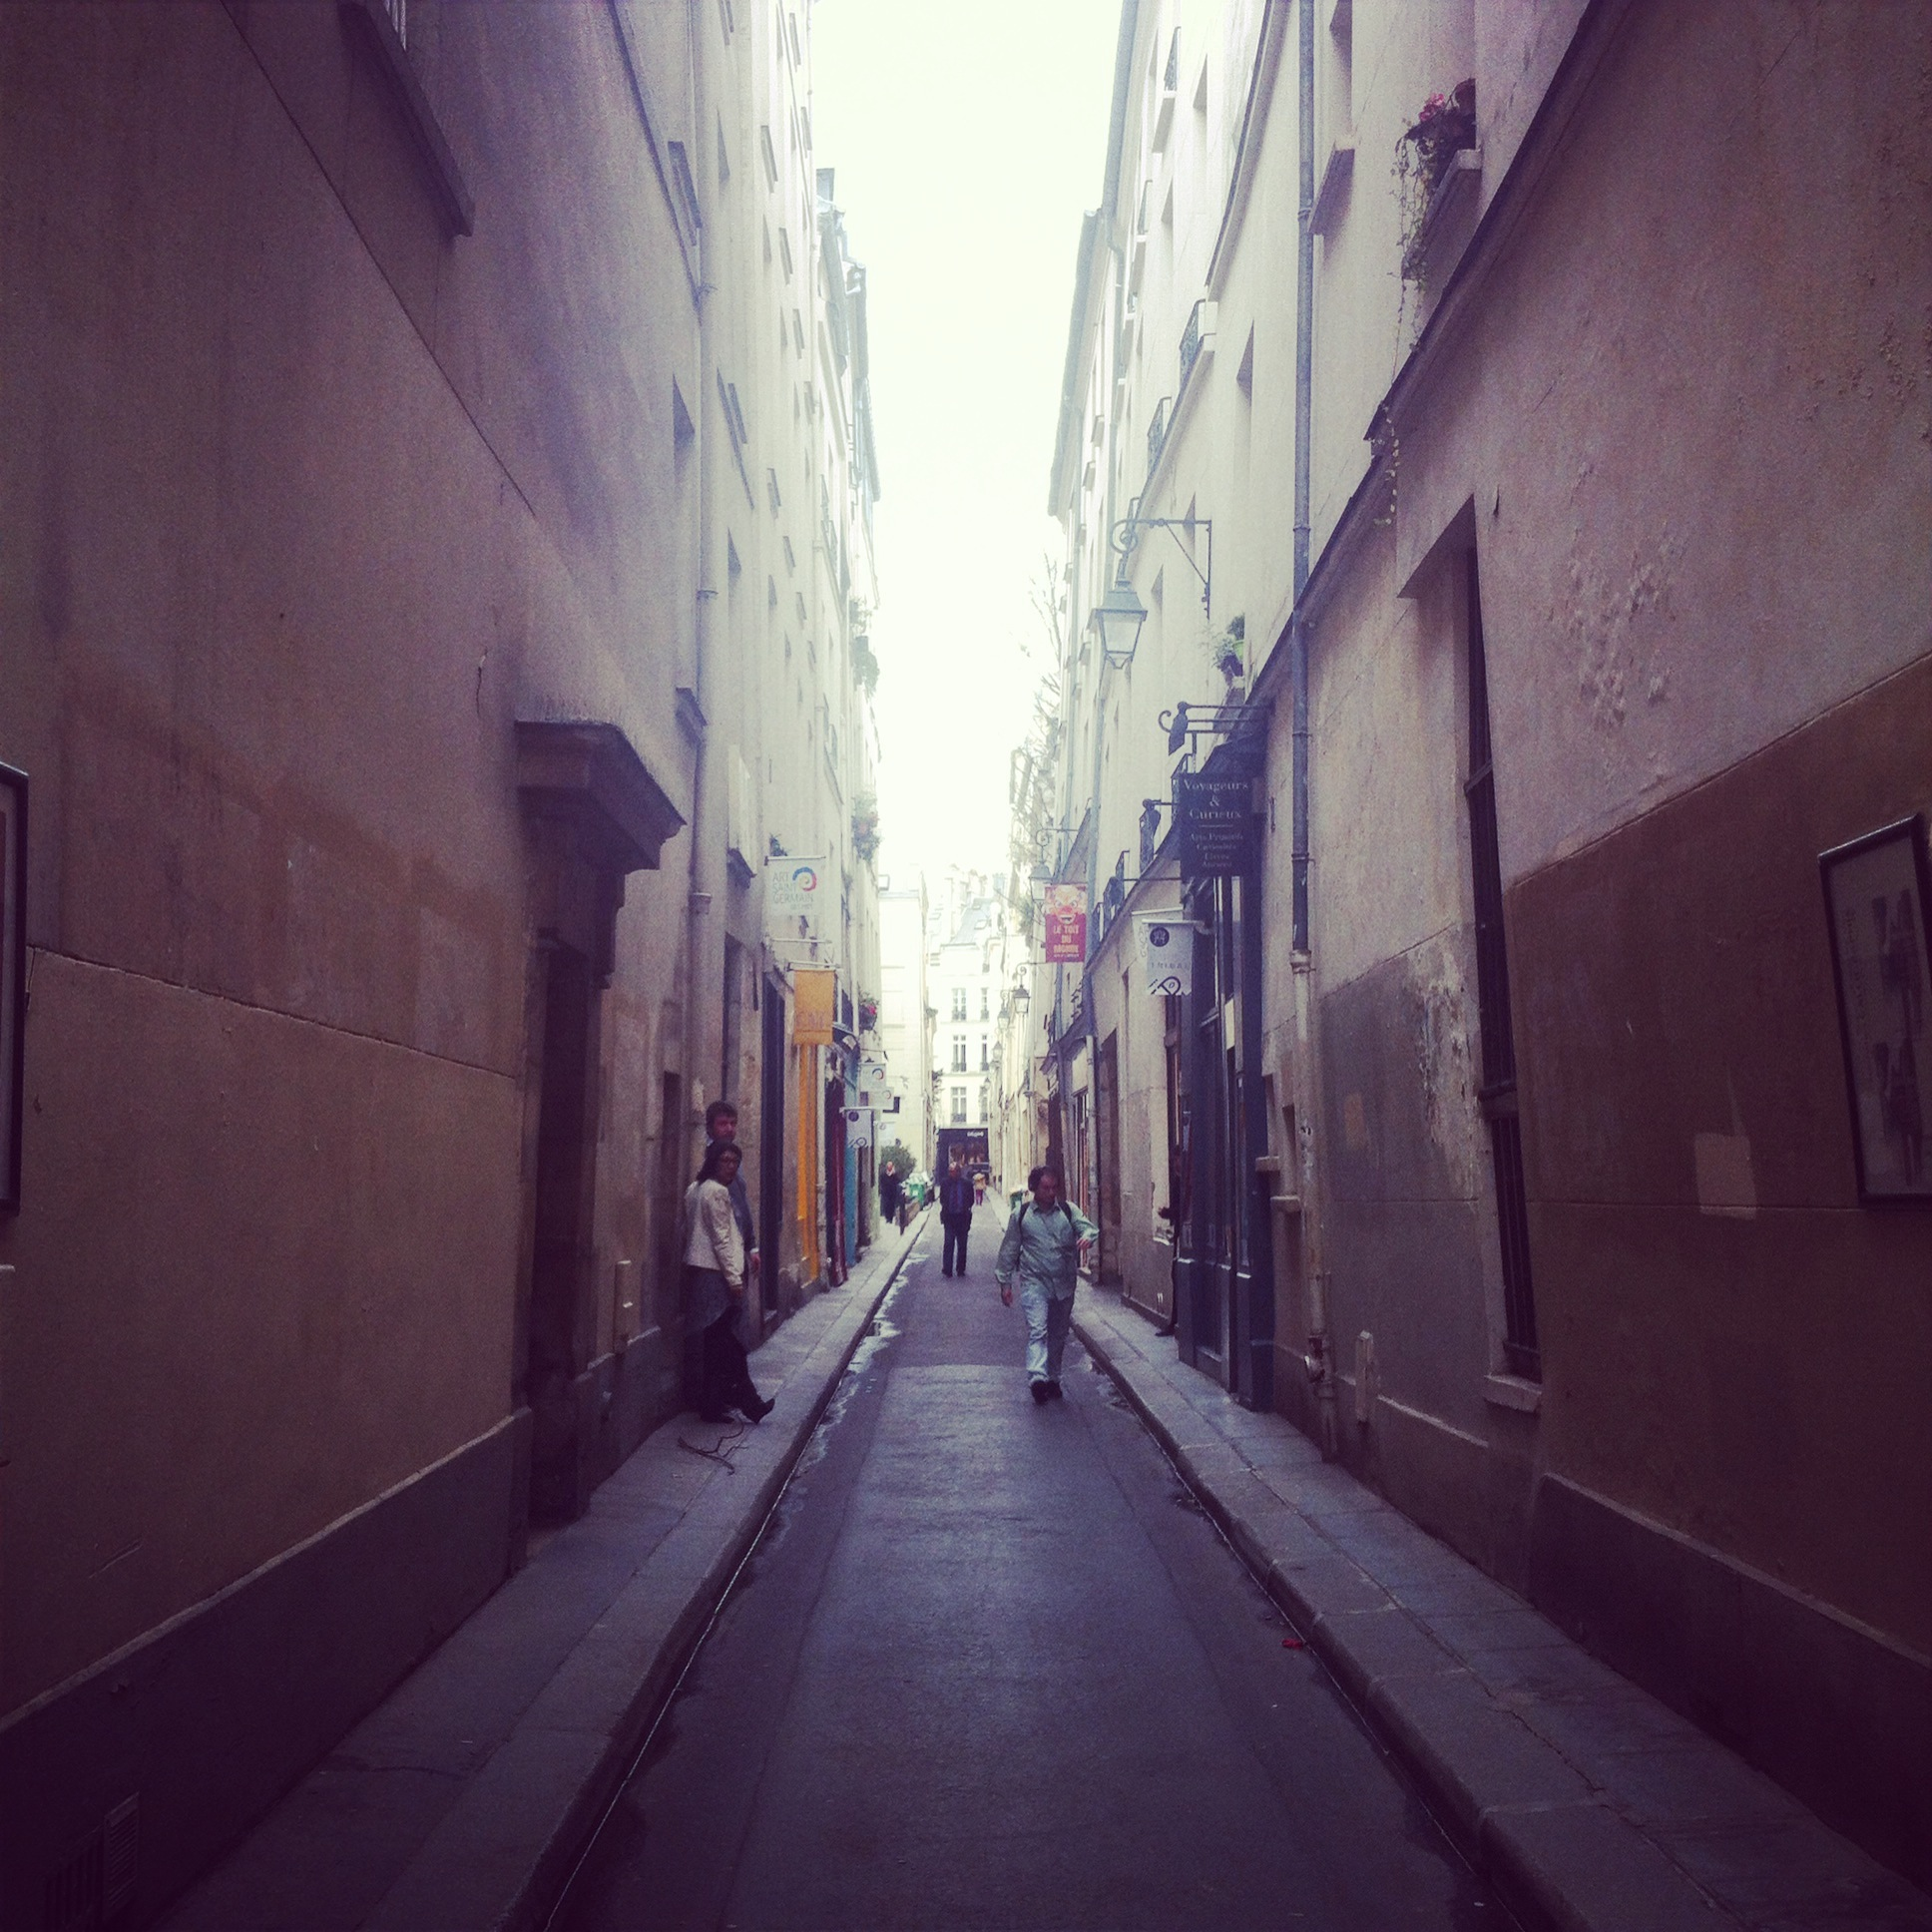 Narrow side street near the Latin Quarter in Paris